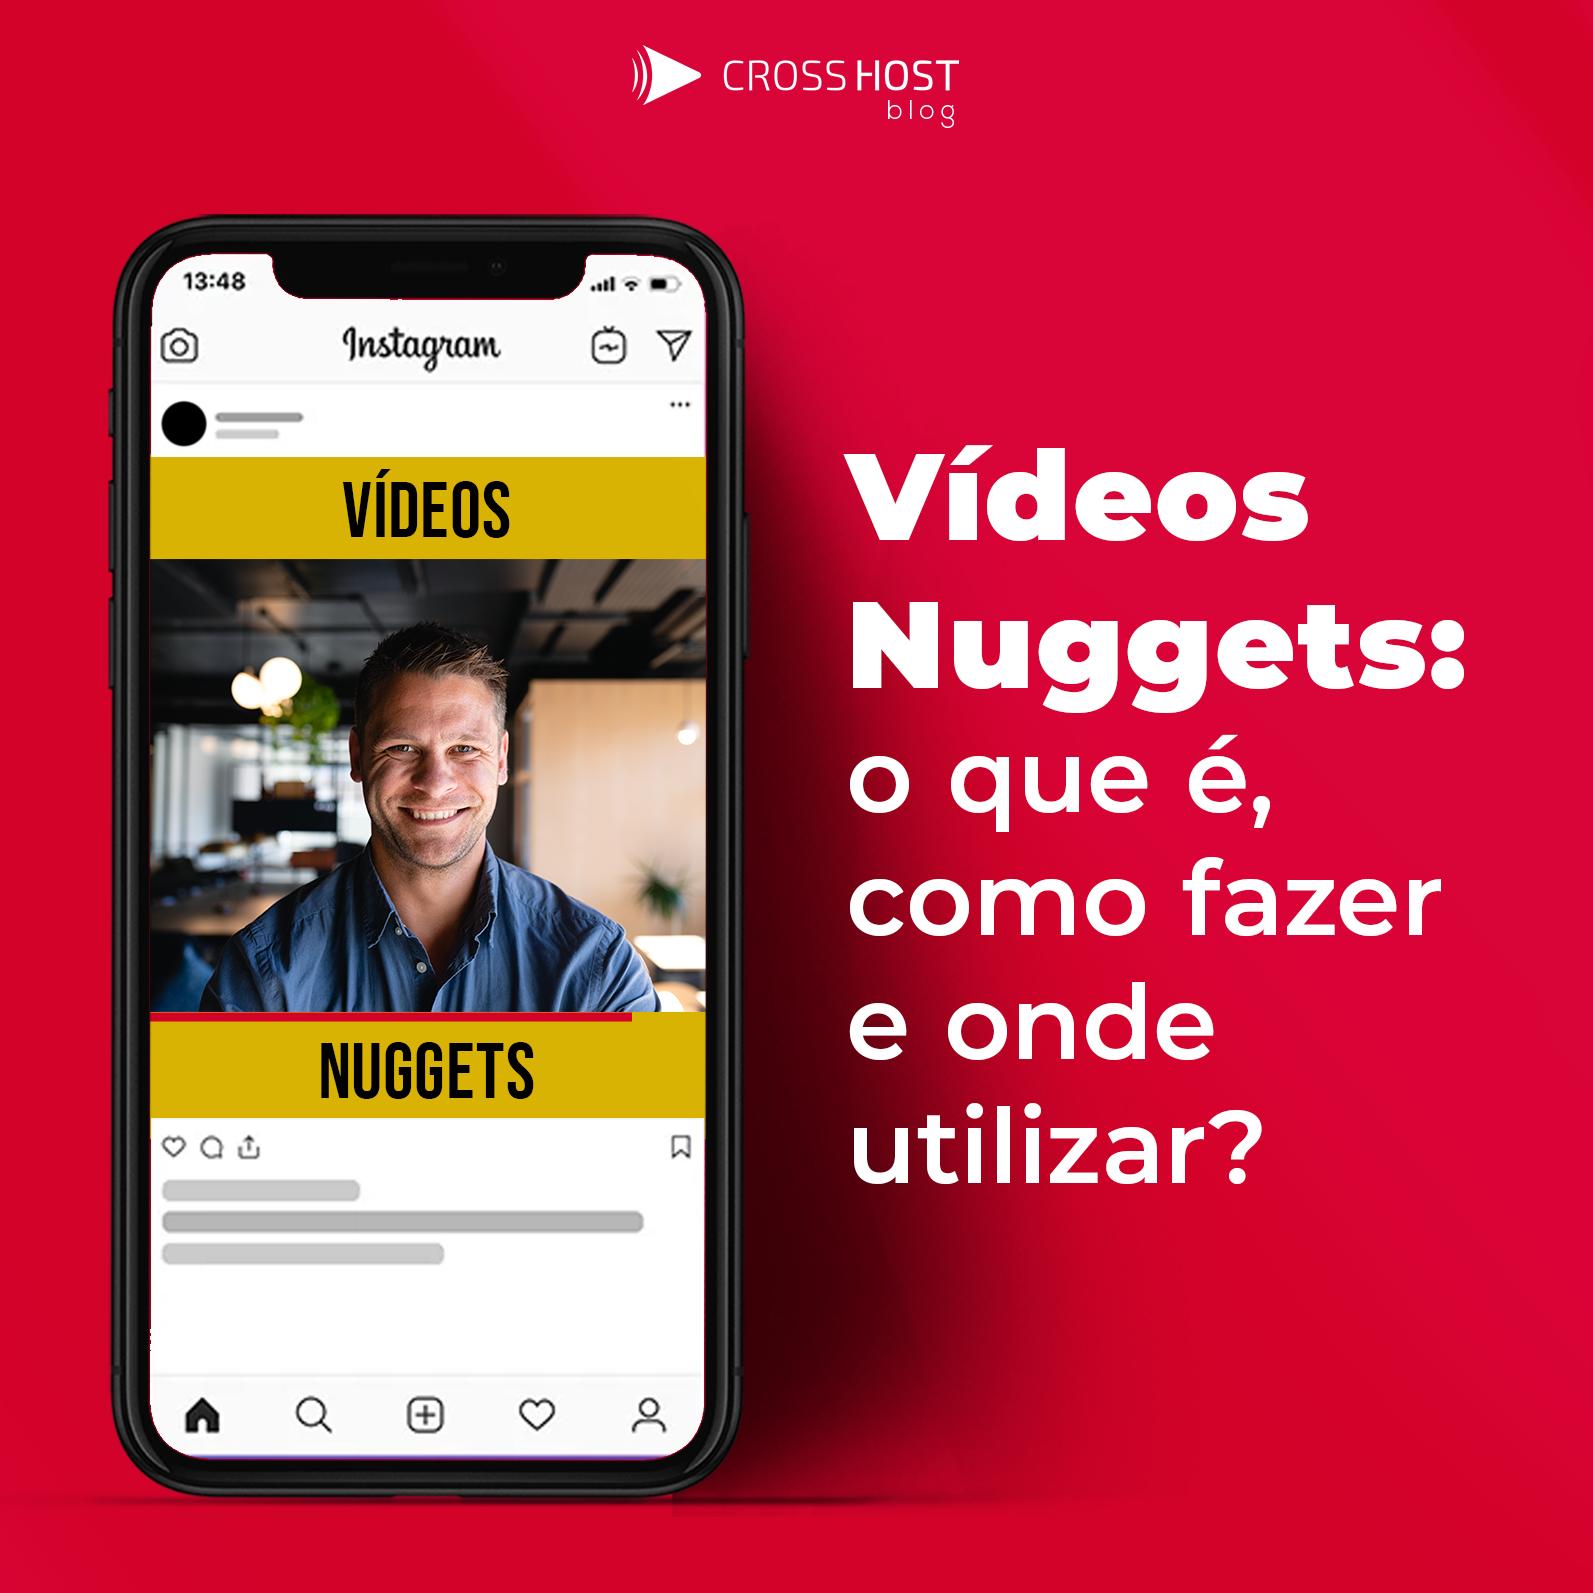 Vídeos Nuggets: o que é, como fazer e onde utilizar?